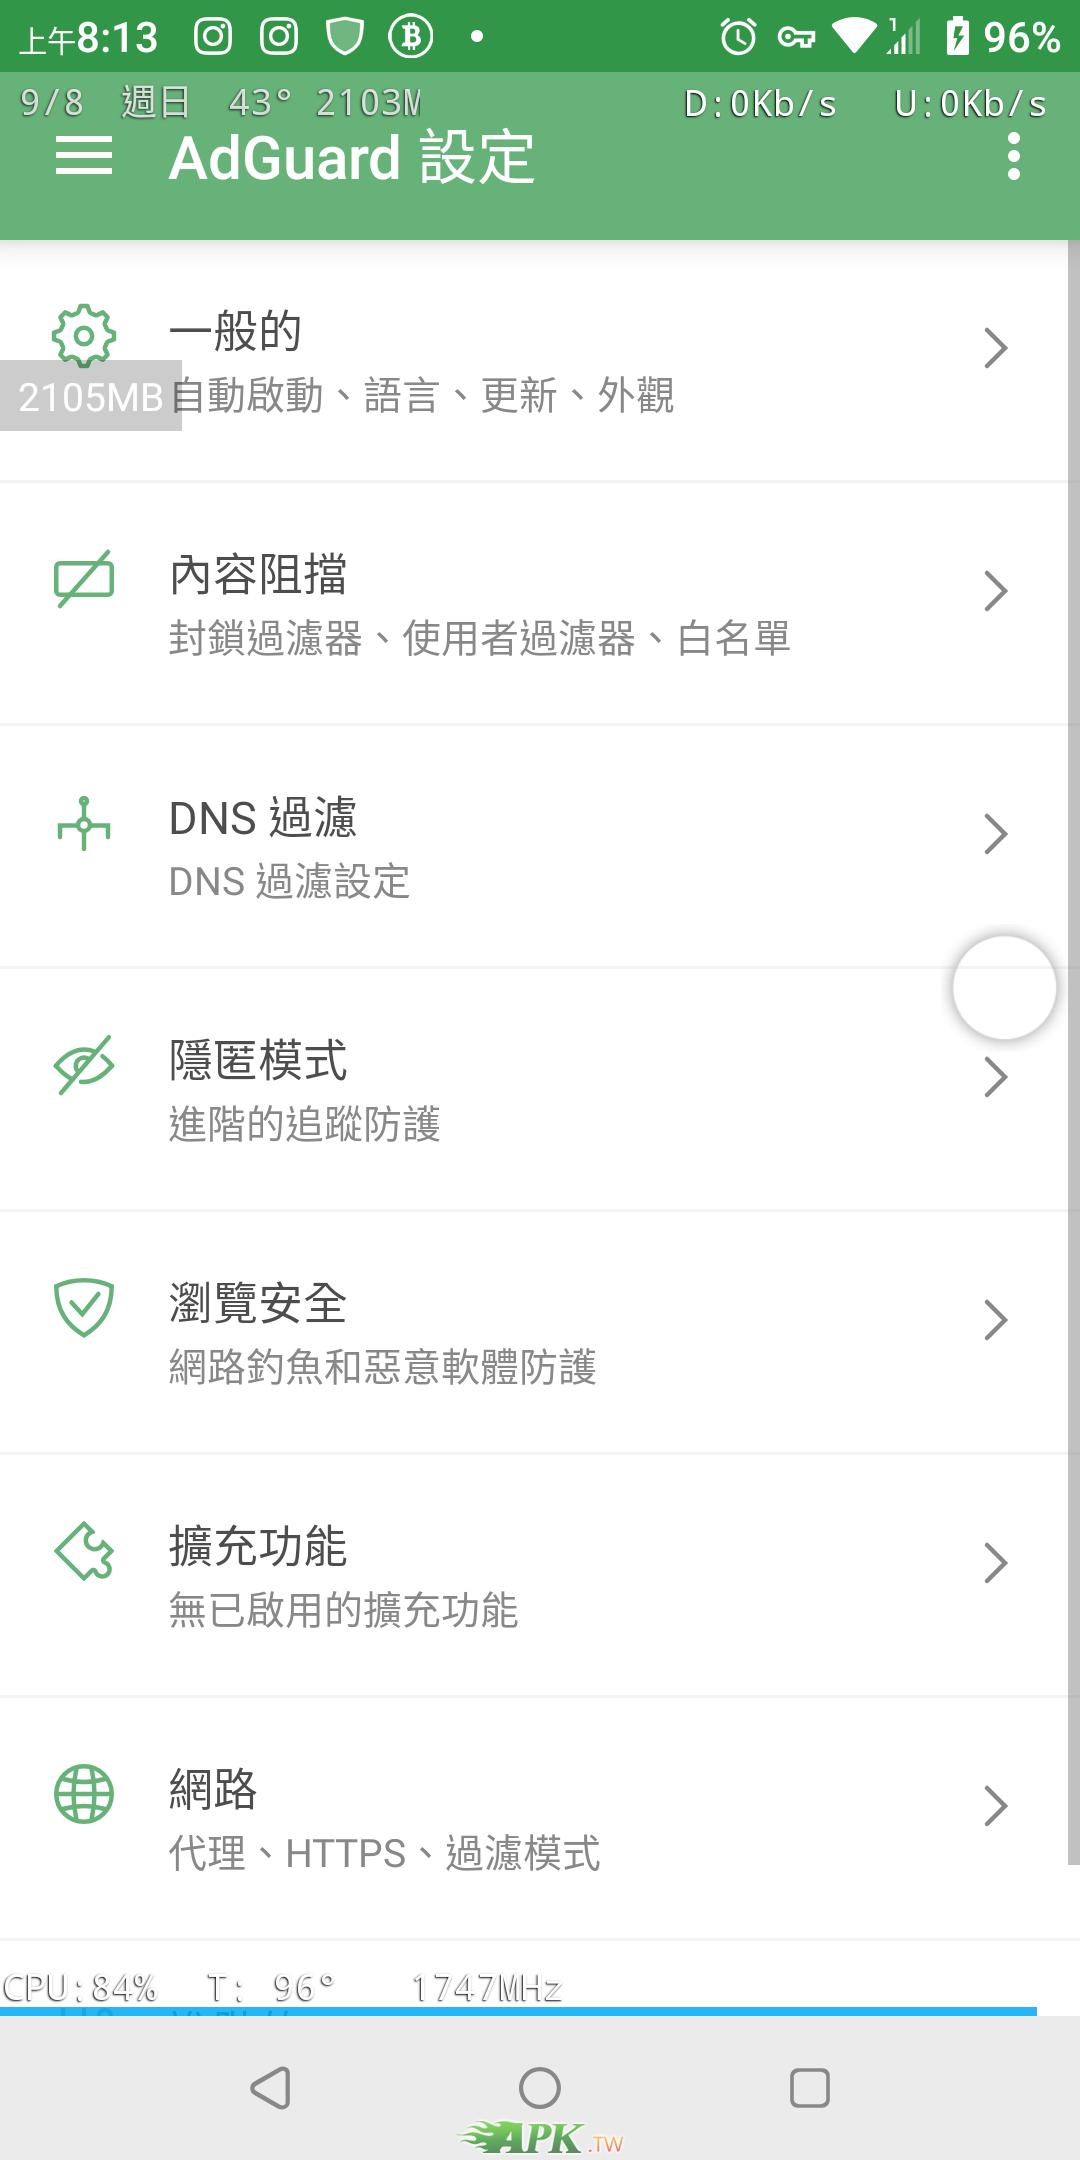 Screenshot_20190908-081314.png